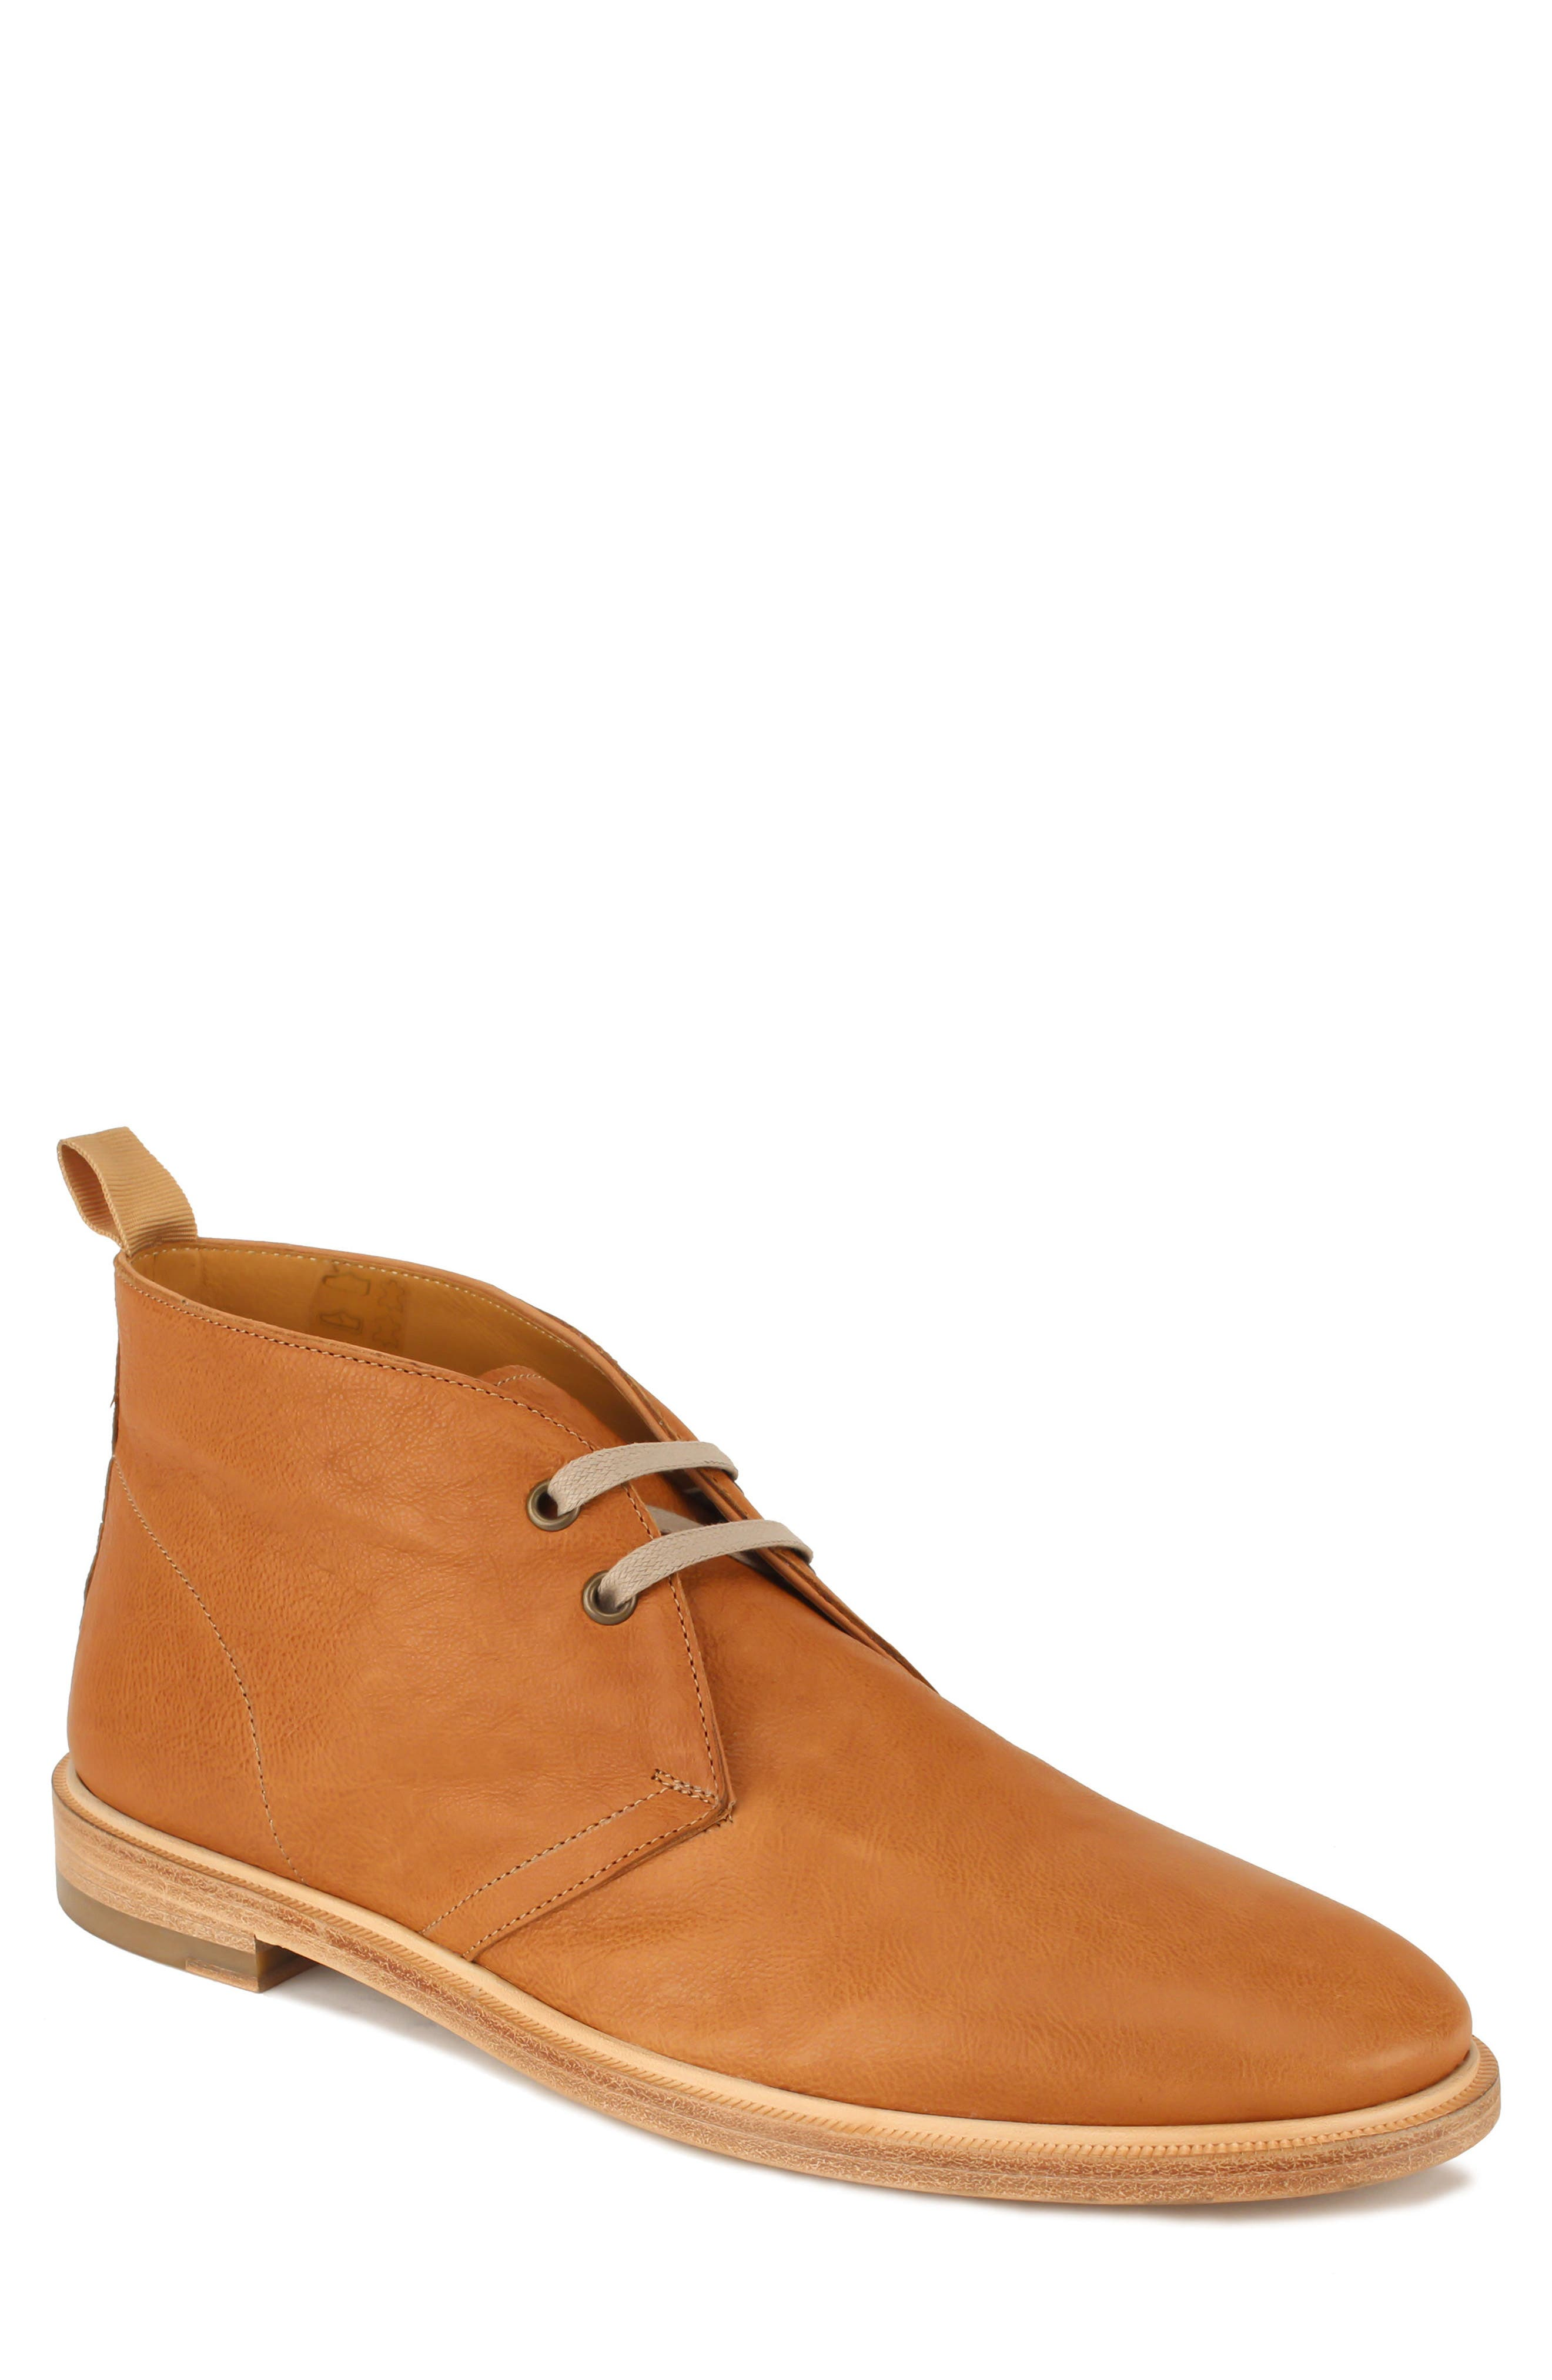 Luke Chukka Boot,                         Main,                         color, Sahara Leather